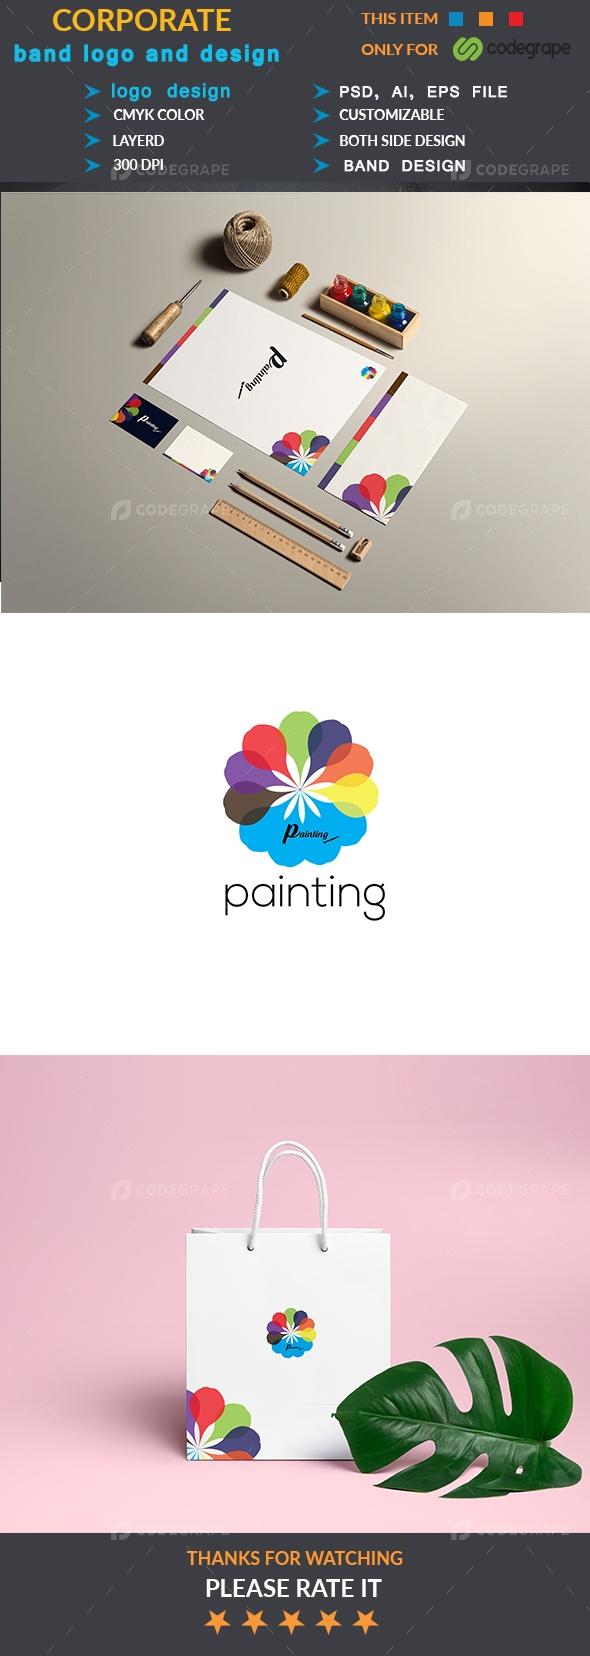 Corporate Painting Logo Design